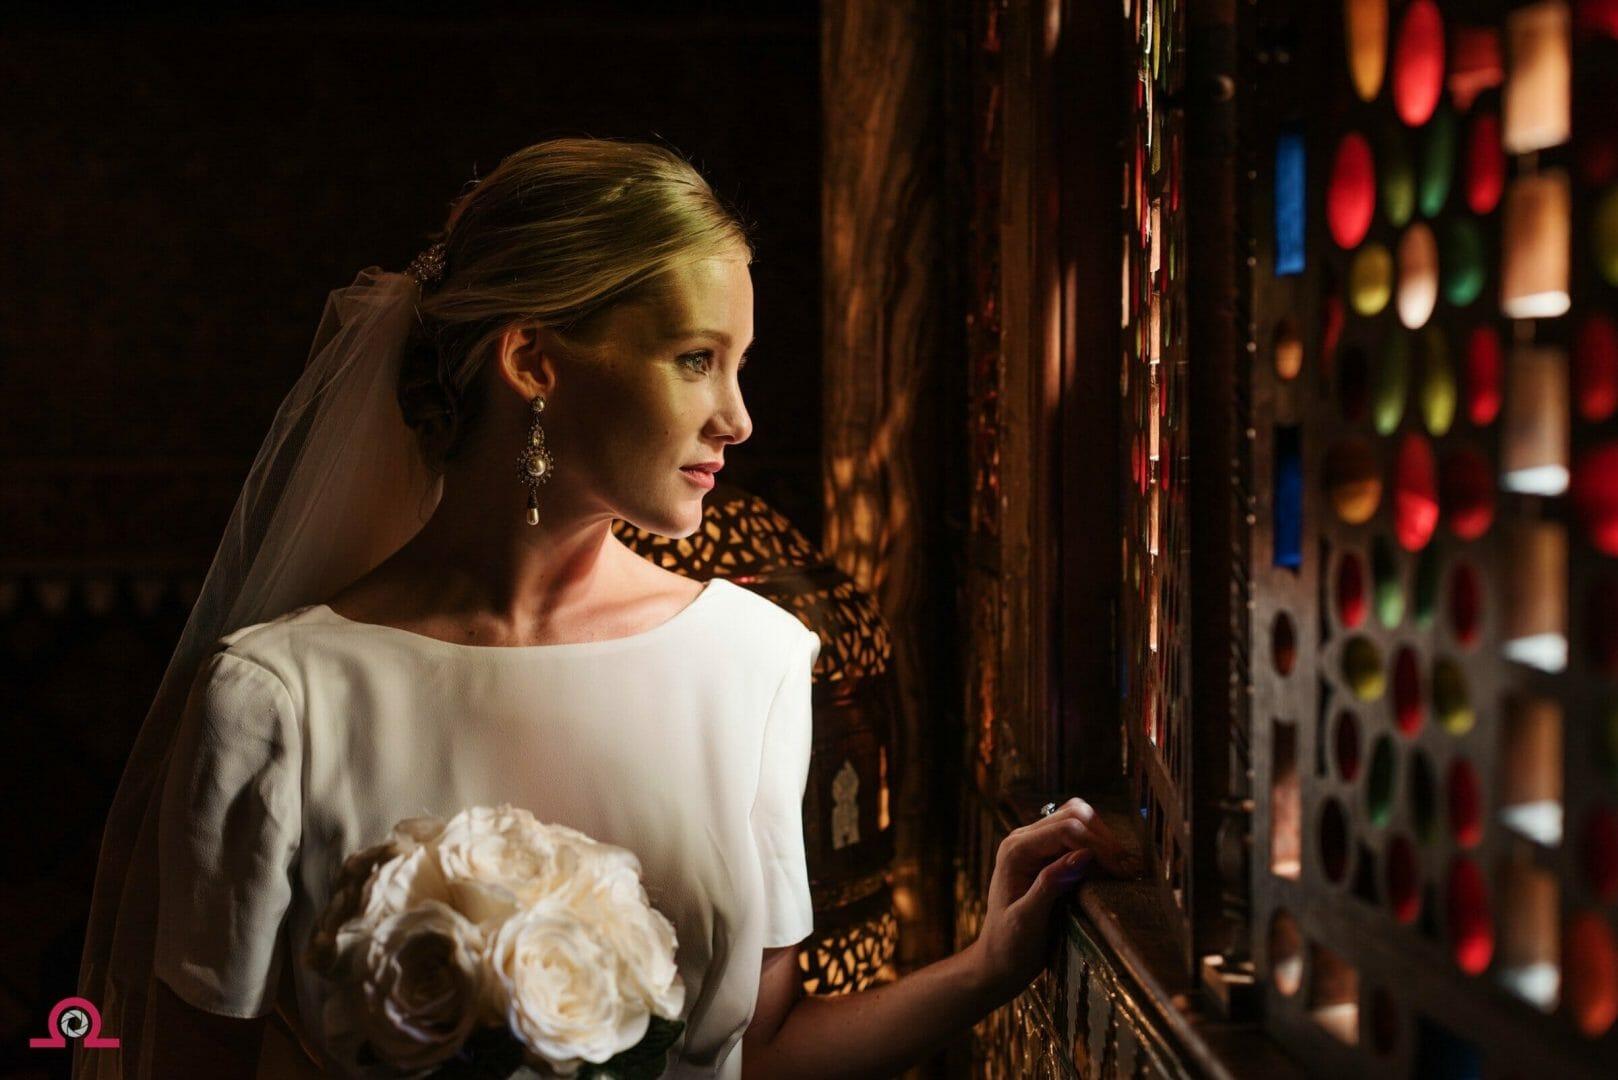 Dorset Wedding Photographer | Libra Photographic